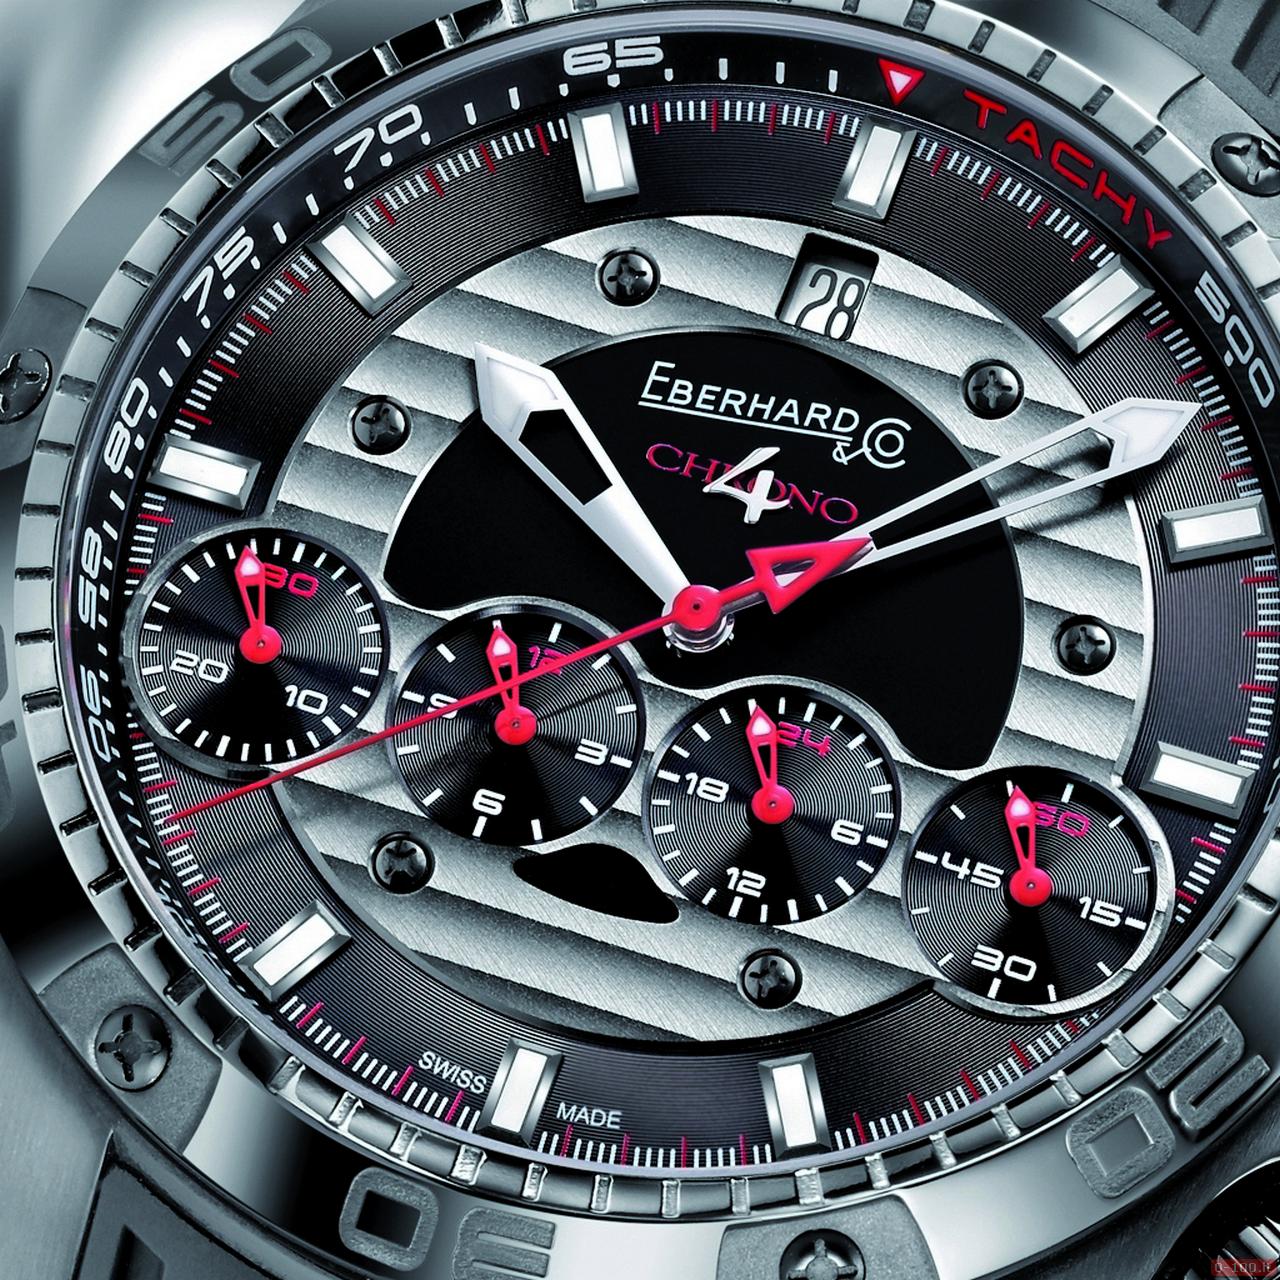 baselworld-2013-eberhard-co-chrono-4-geant-full-injection_0-100 3